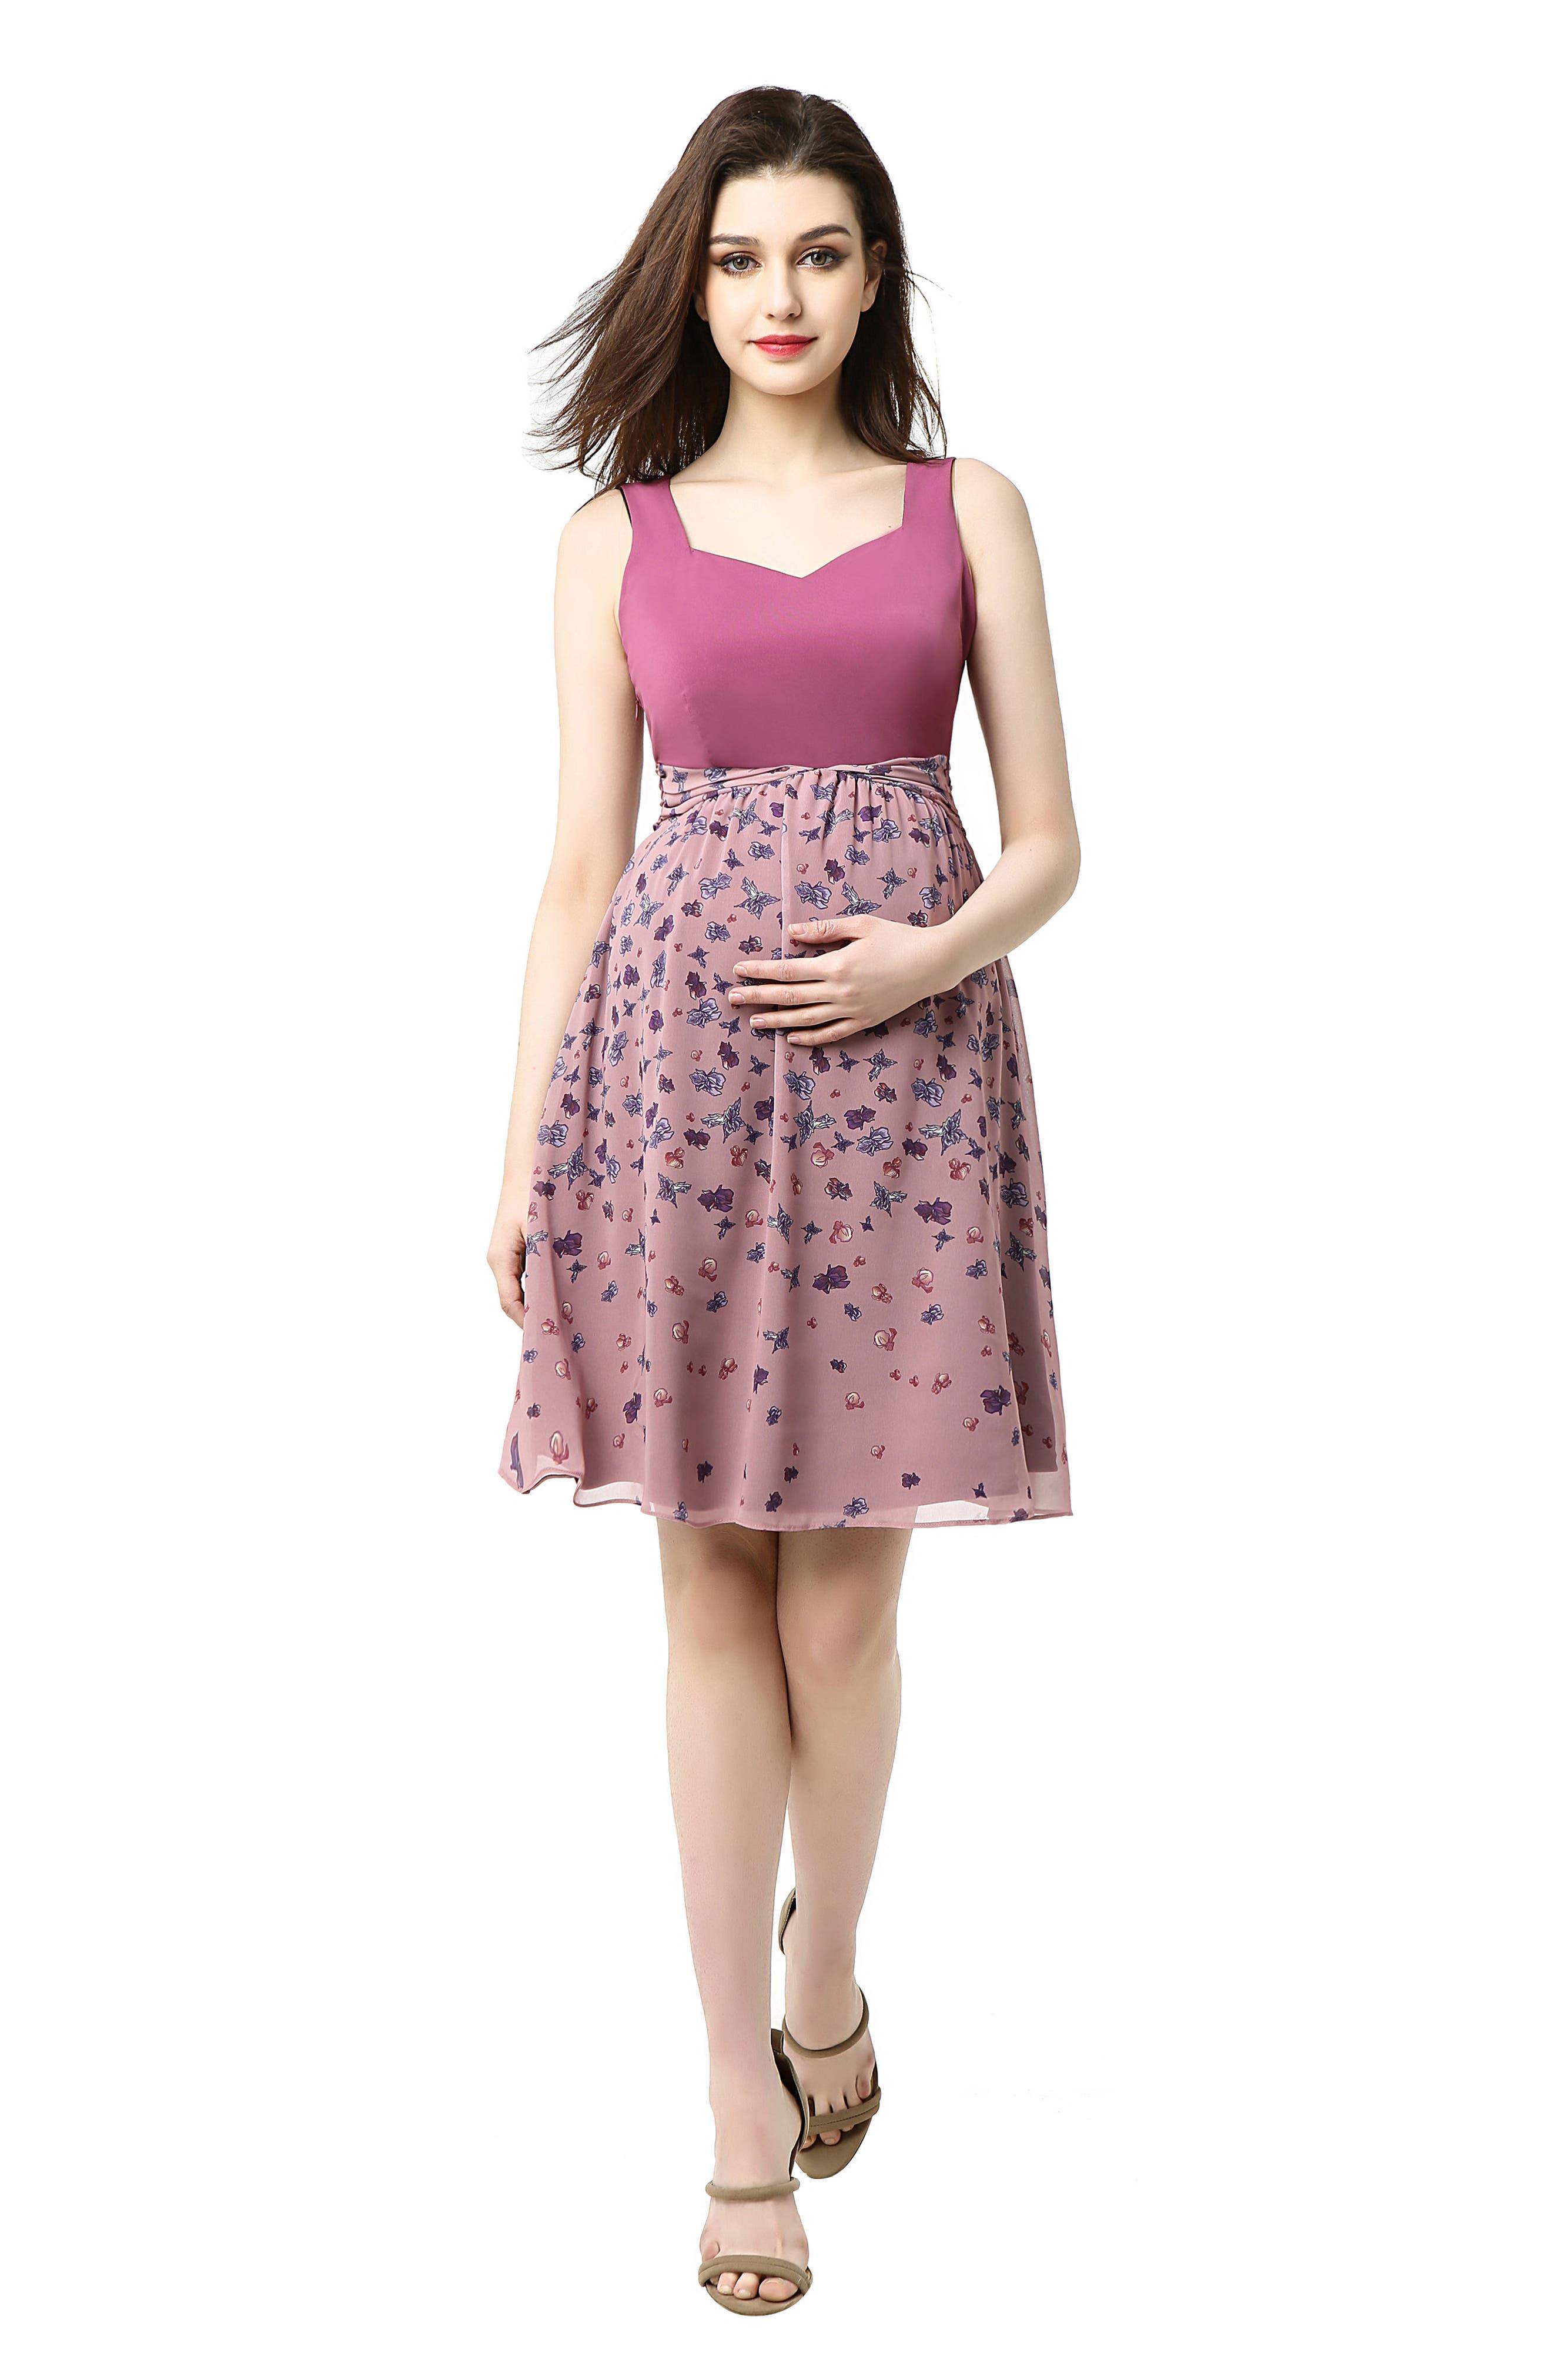 Libby Print Skirt Maternity Dress,                             Alternate thumbnail 5, color,                             ROSE PINK